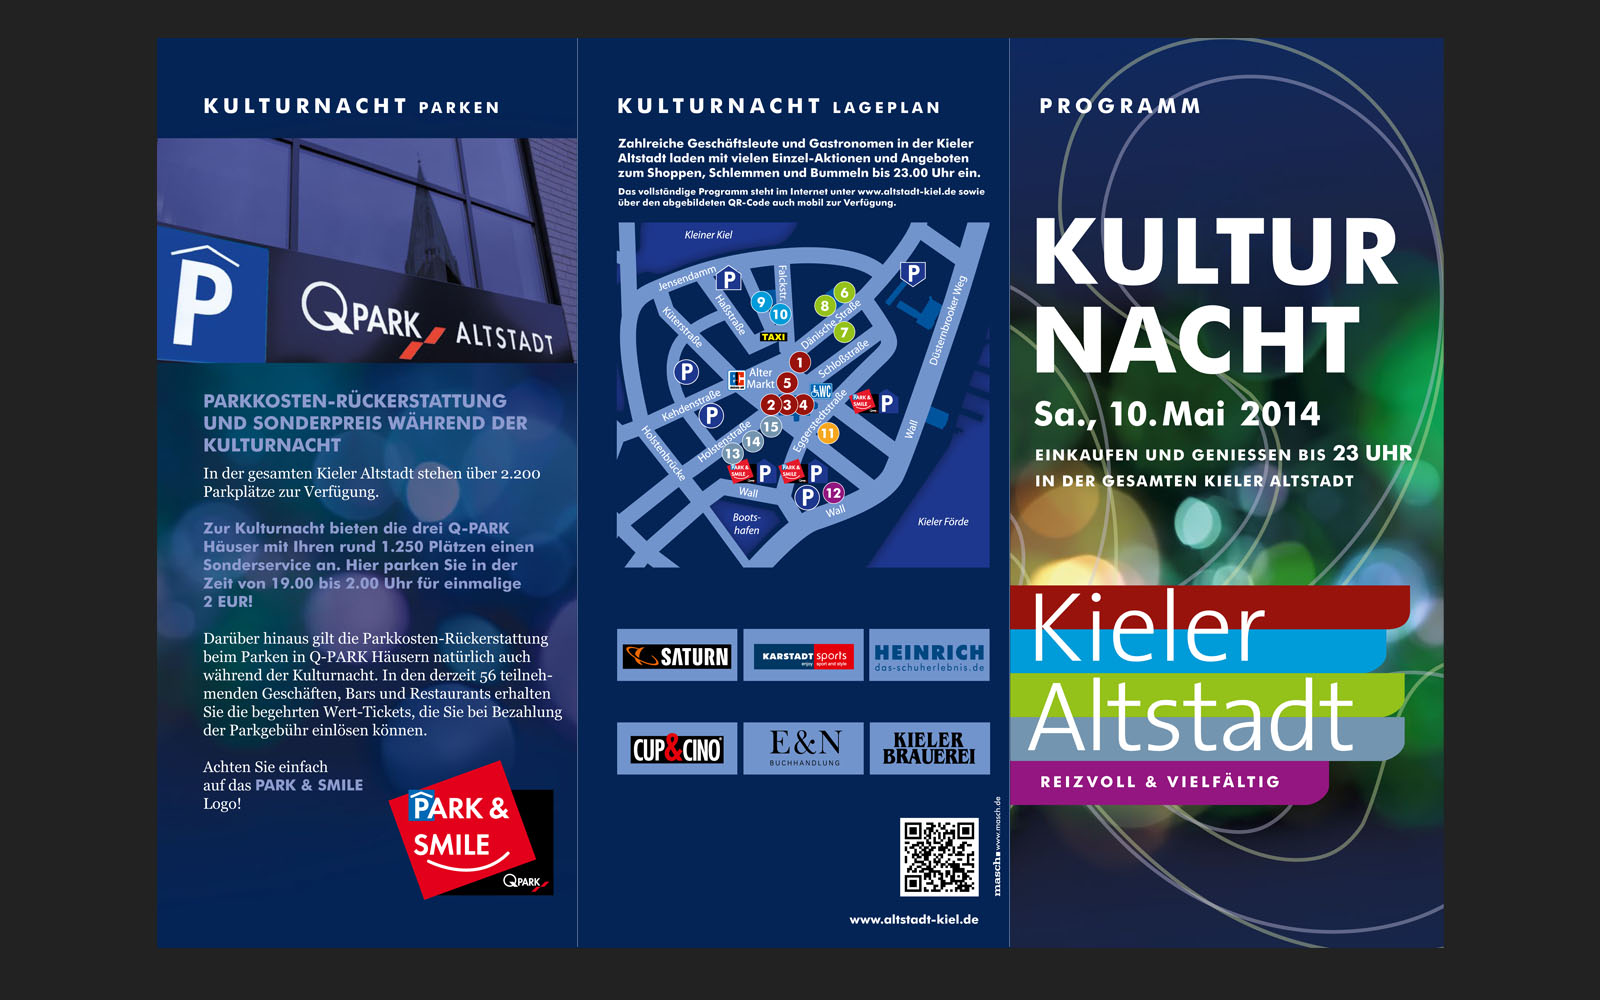 kulturnacht14 03.jpg